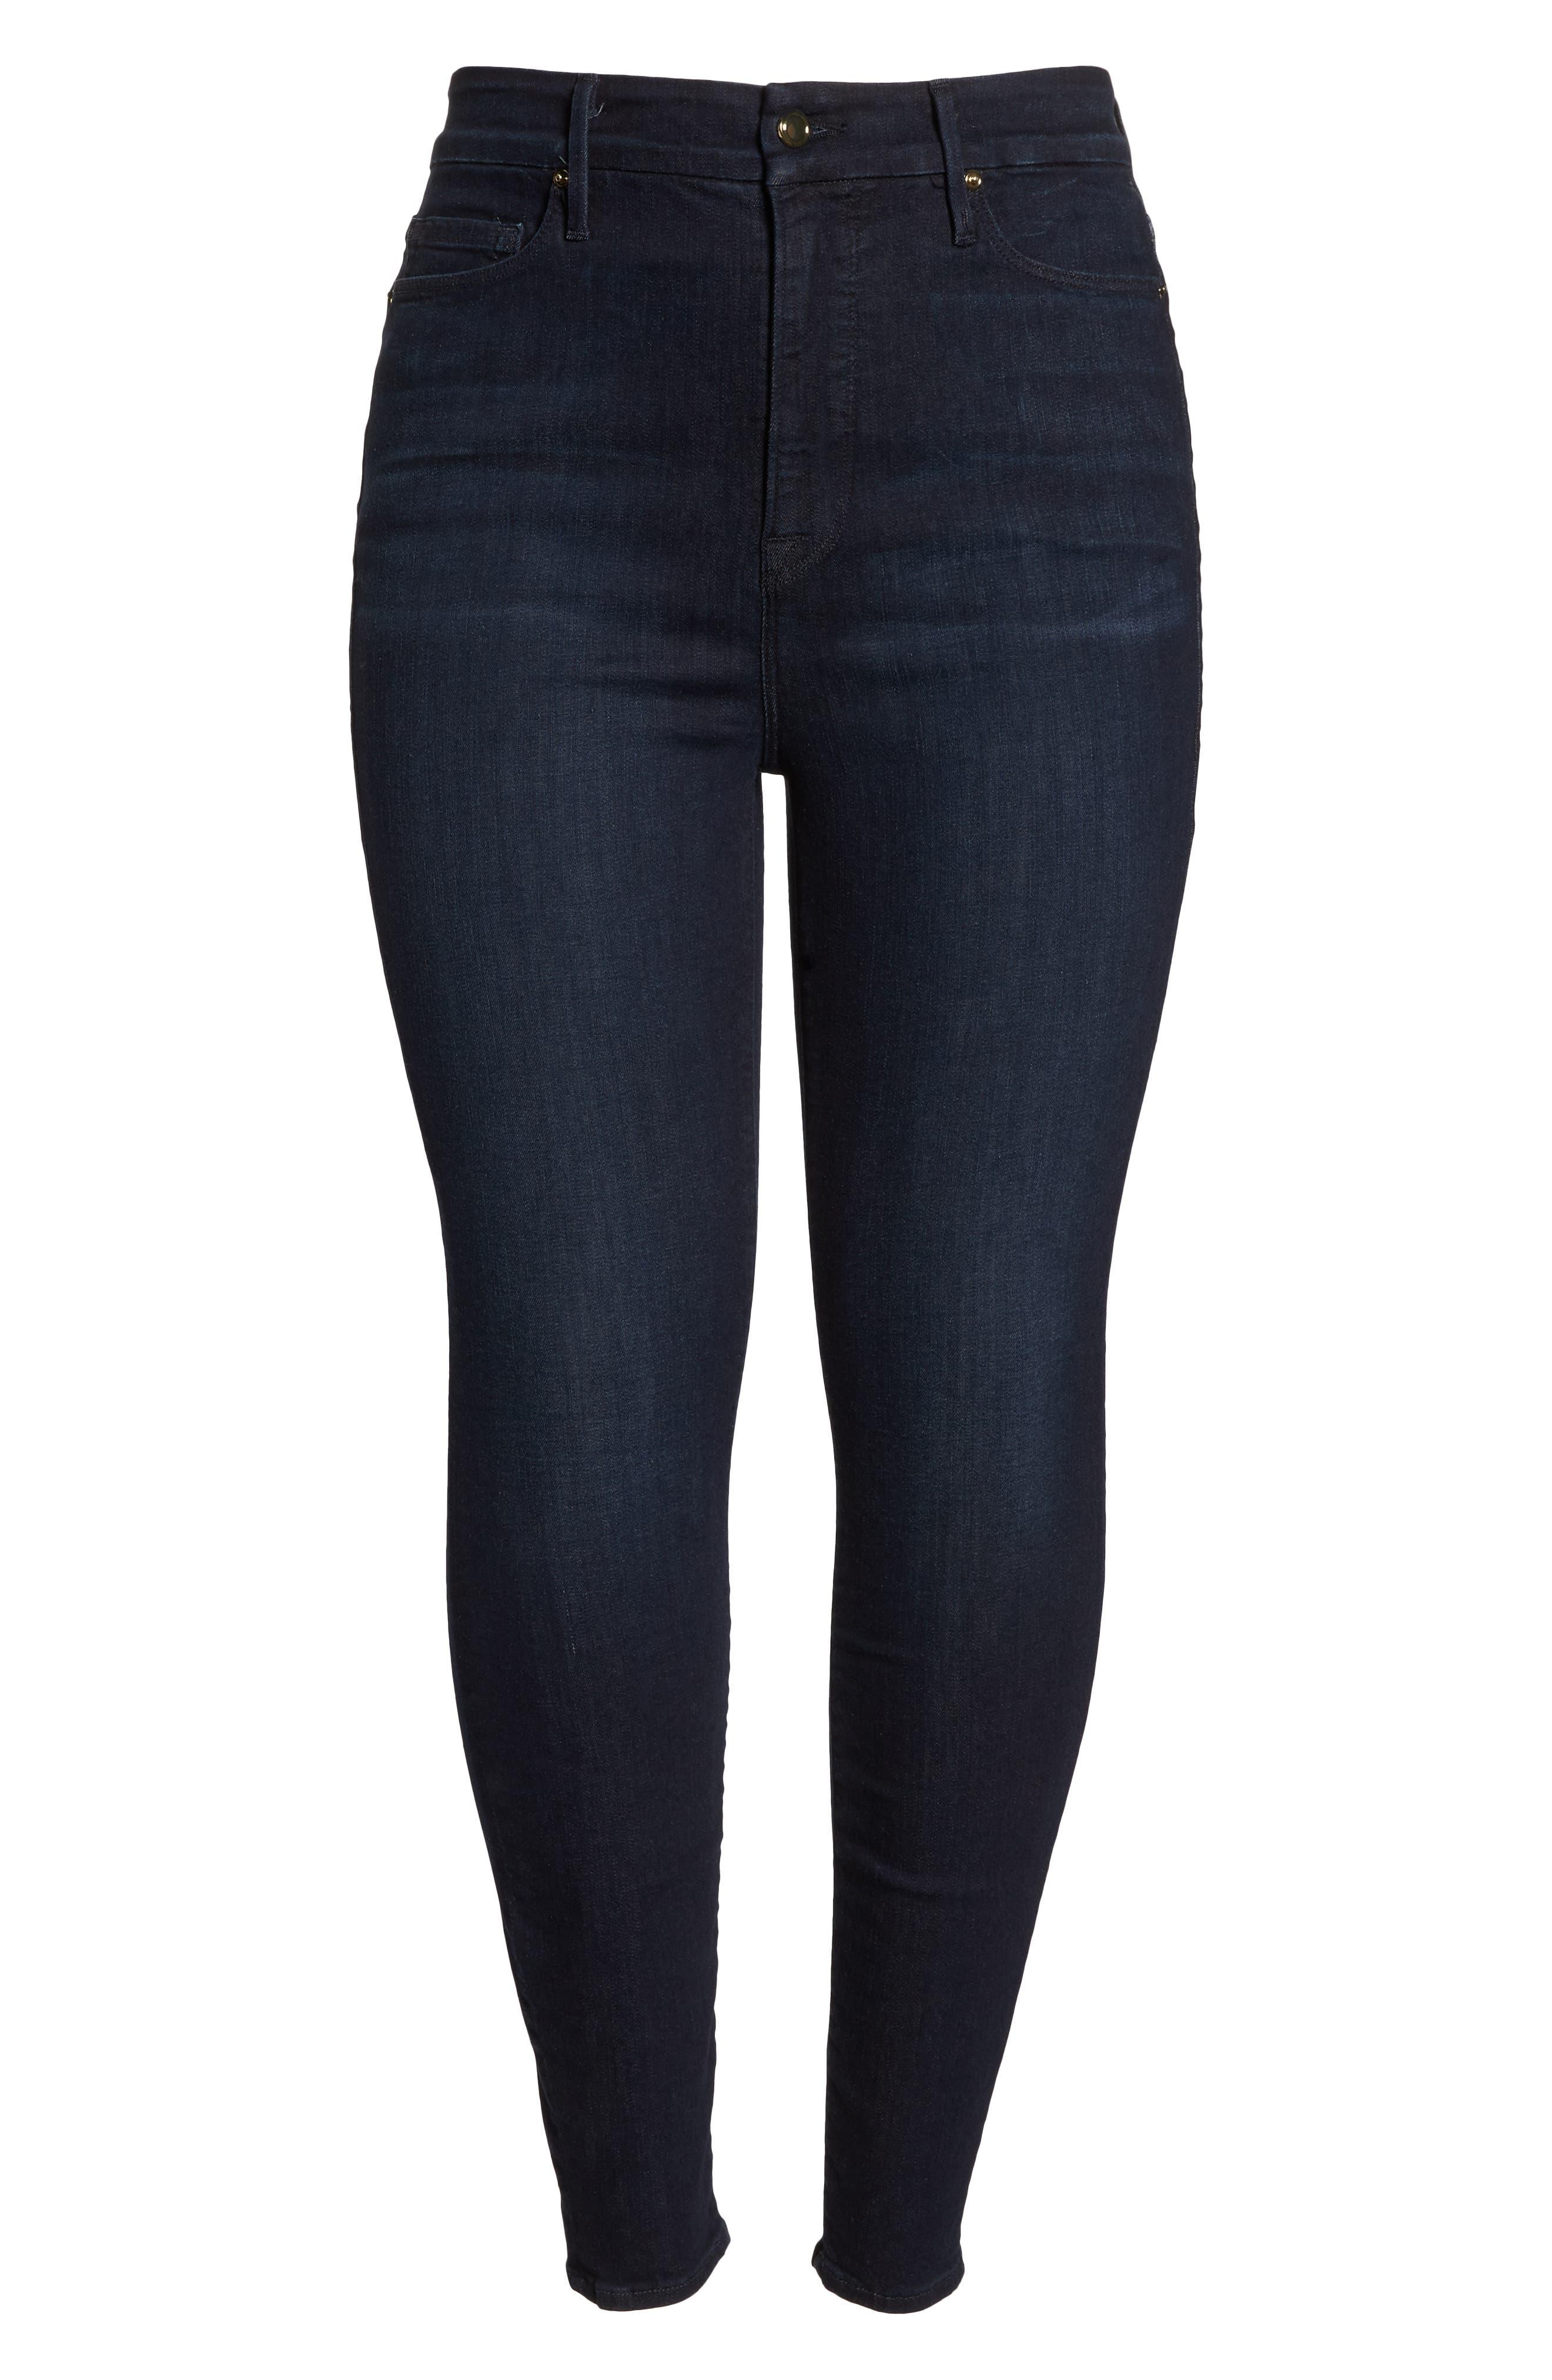 GOOD AMERICAN, Good Legs High Waist Skinny Jeans, Alternate thumbnail 13, color, BLUE224